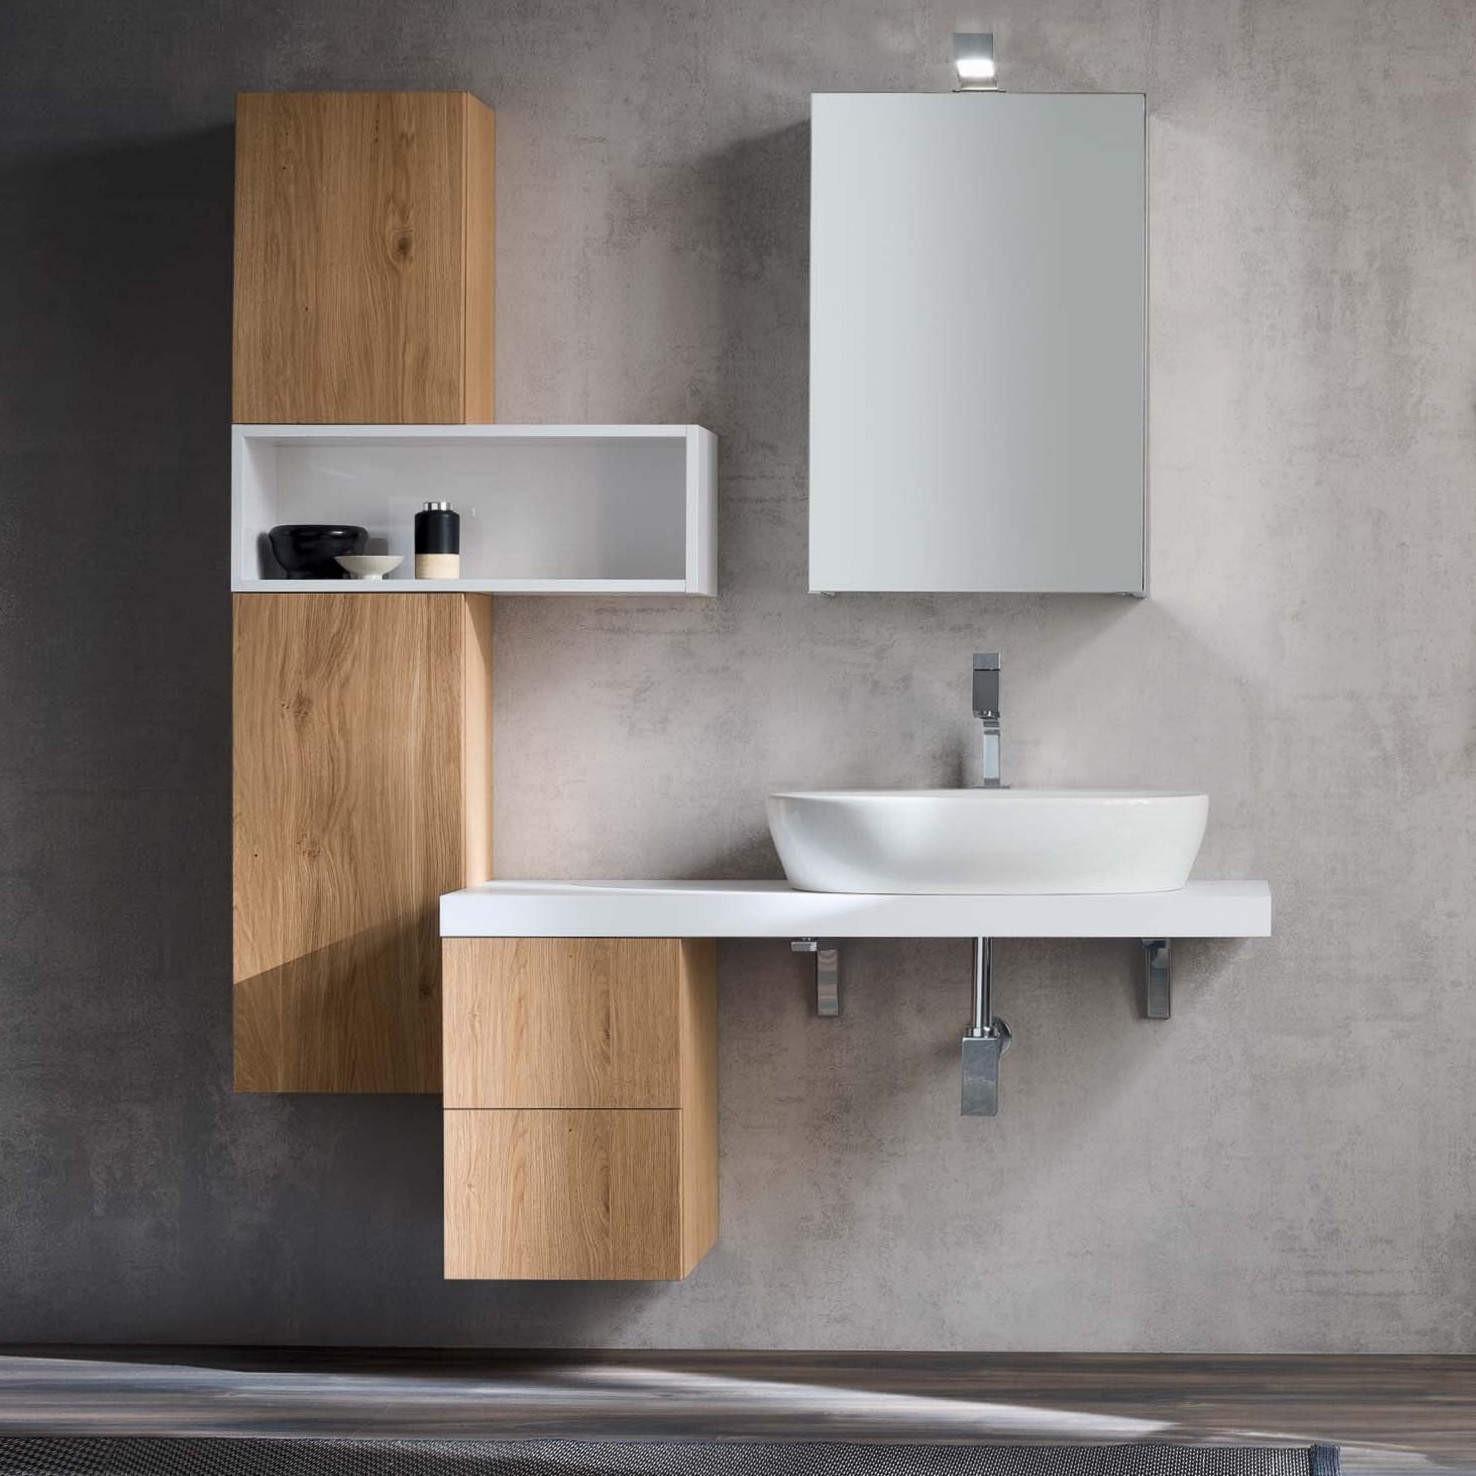 Arredaclick blog mobile bagno moderno una mensola per il lavabo arredaclick for Mobile lavabo bagno piccolo